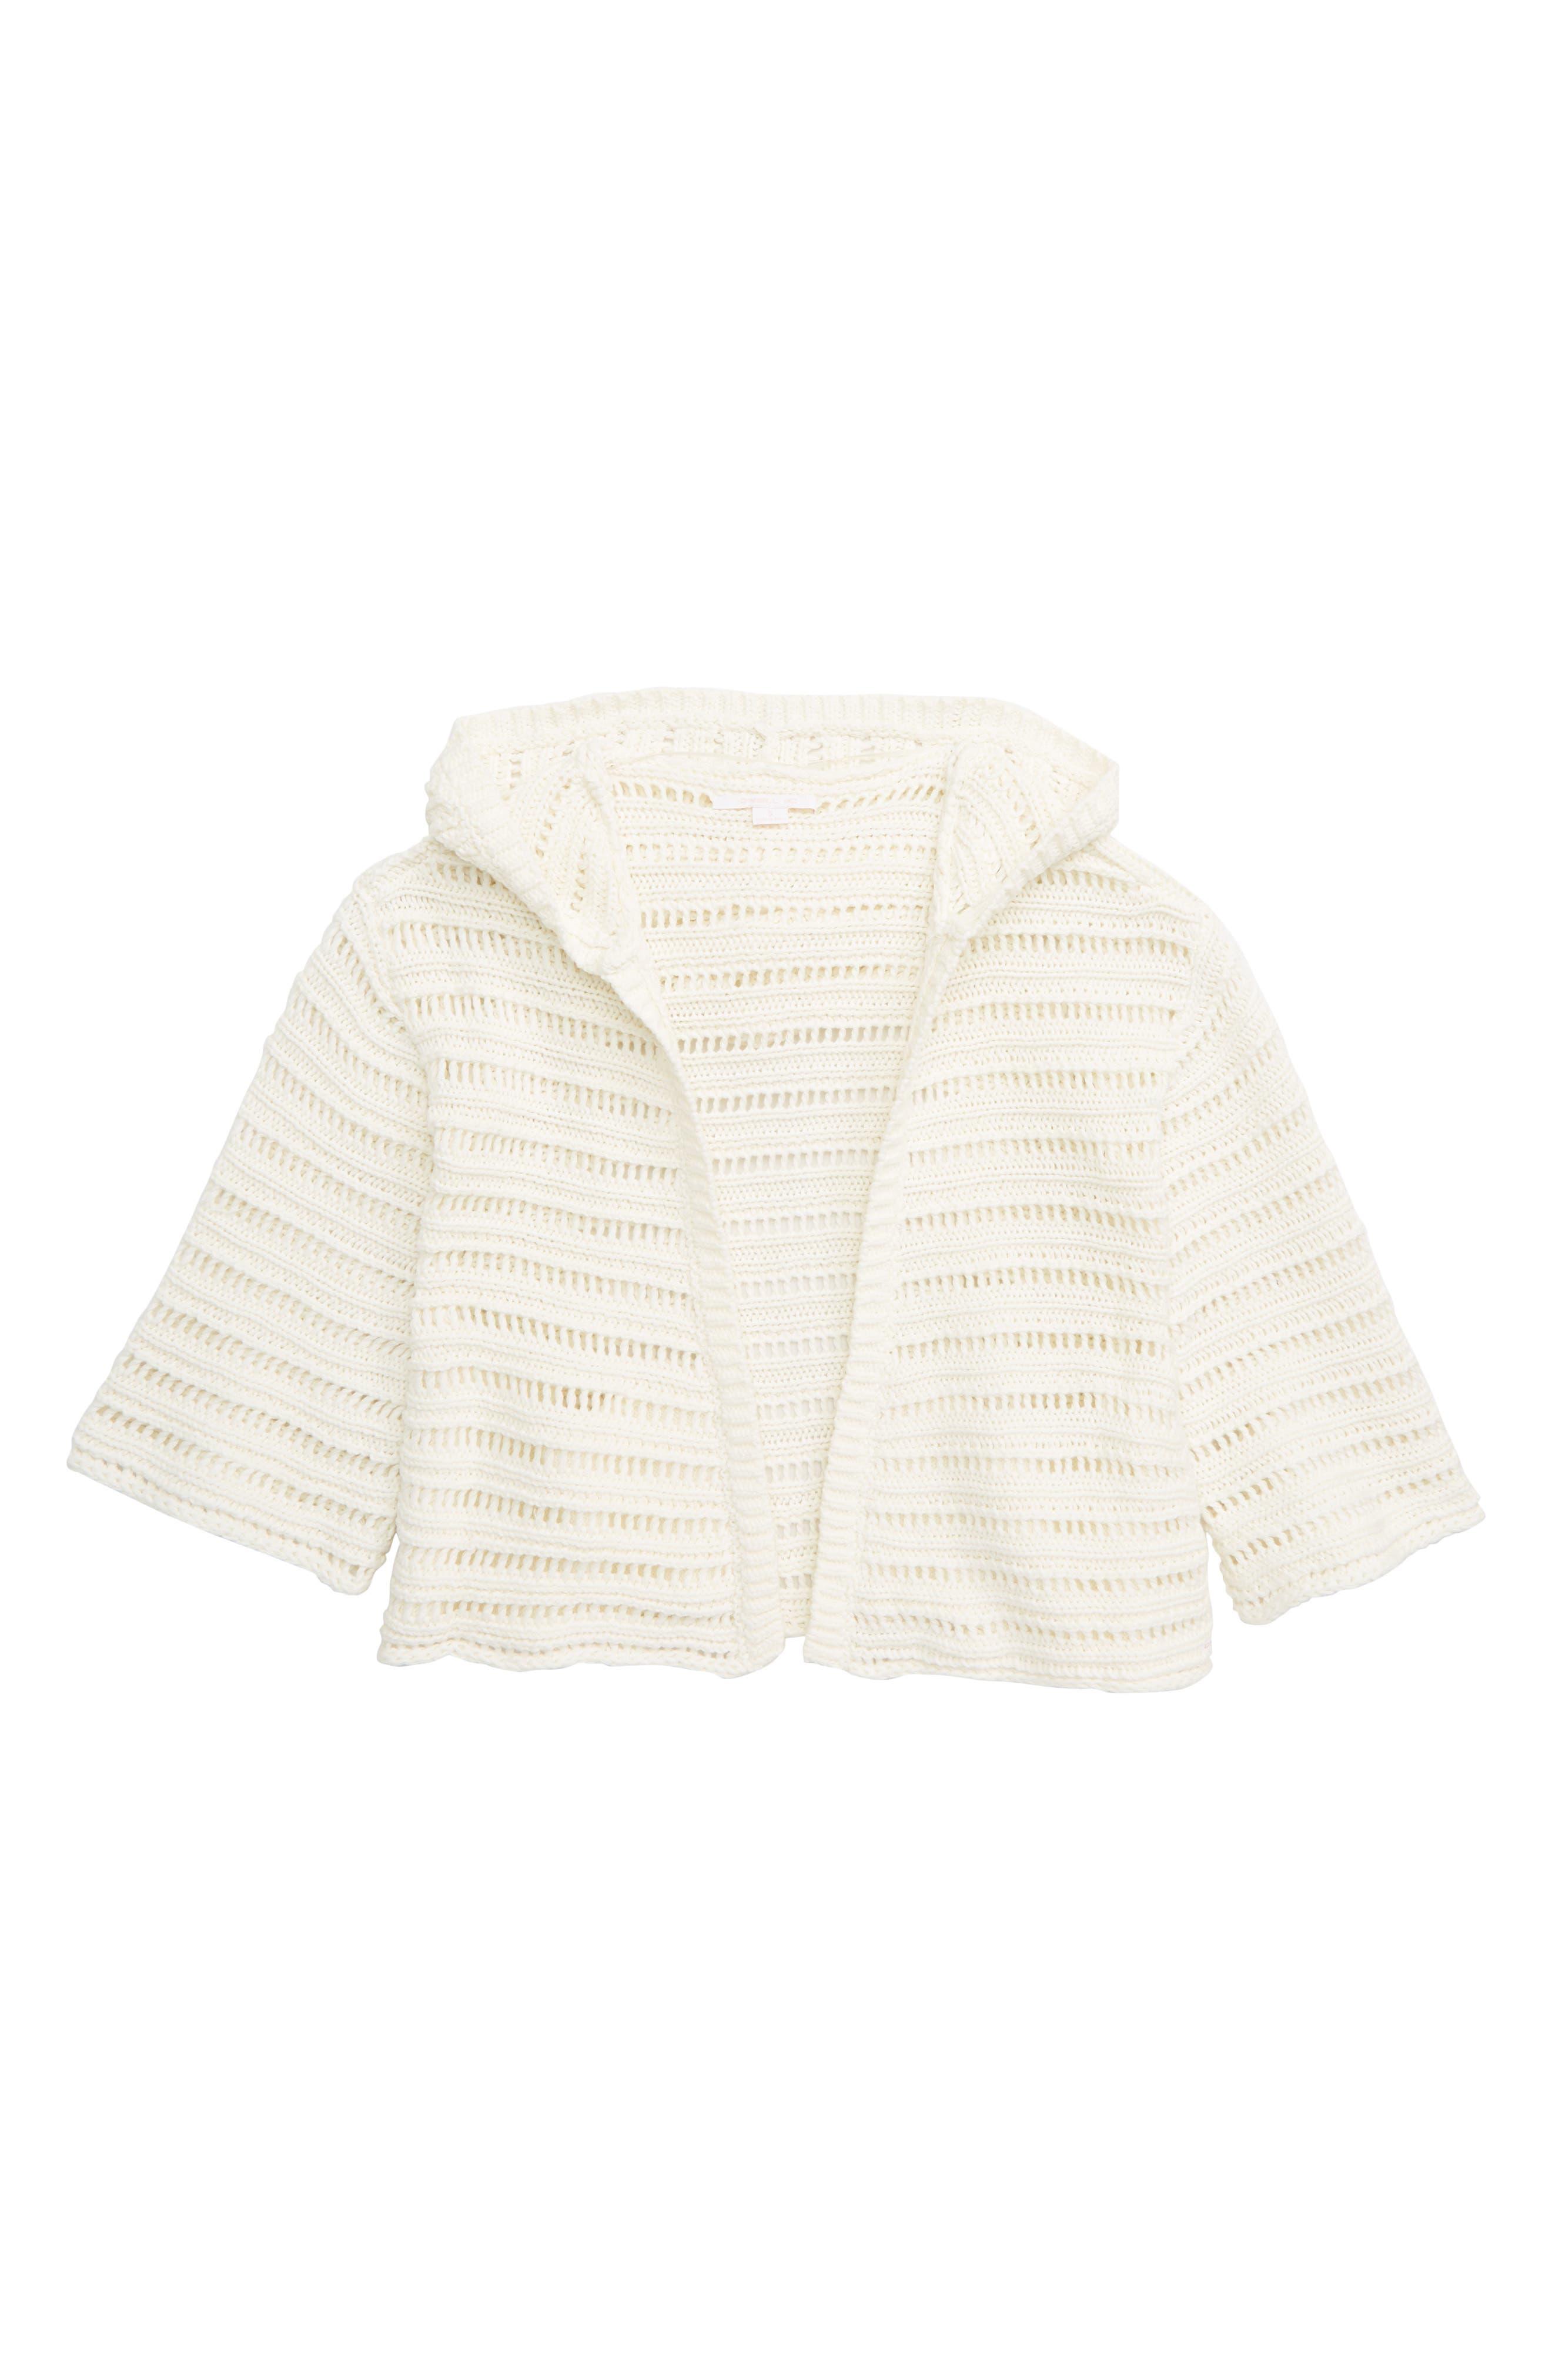 Girls ONeill Bayline Hooded Cardigan Sweater Size L (1214)  Beige